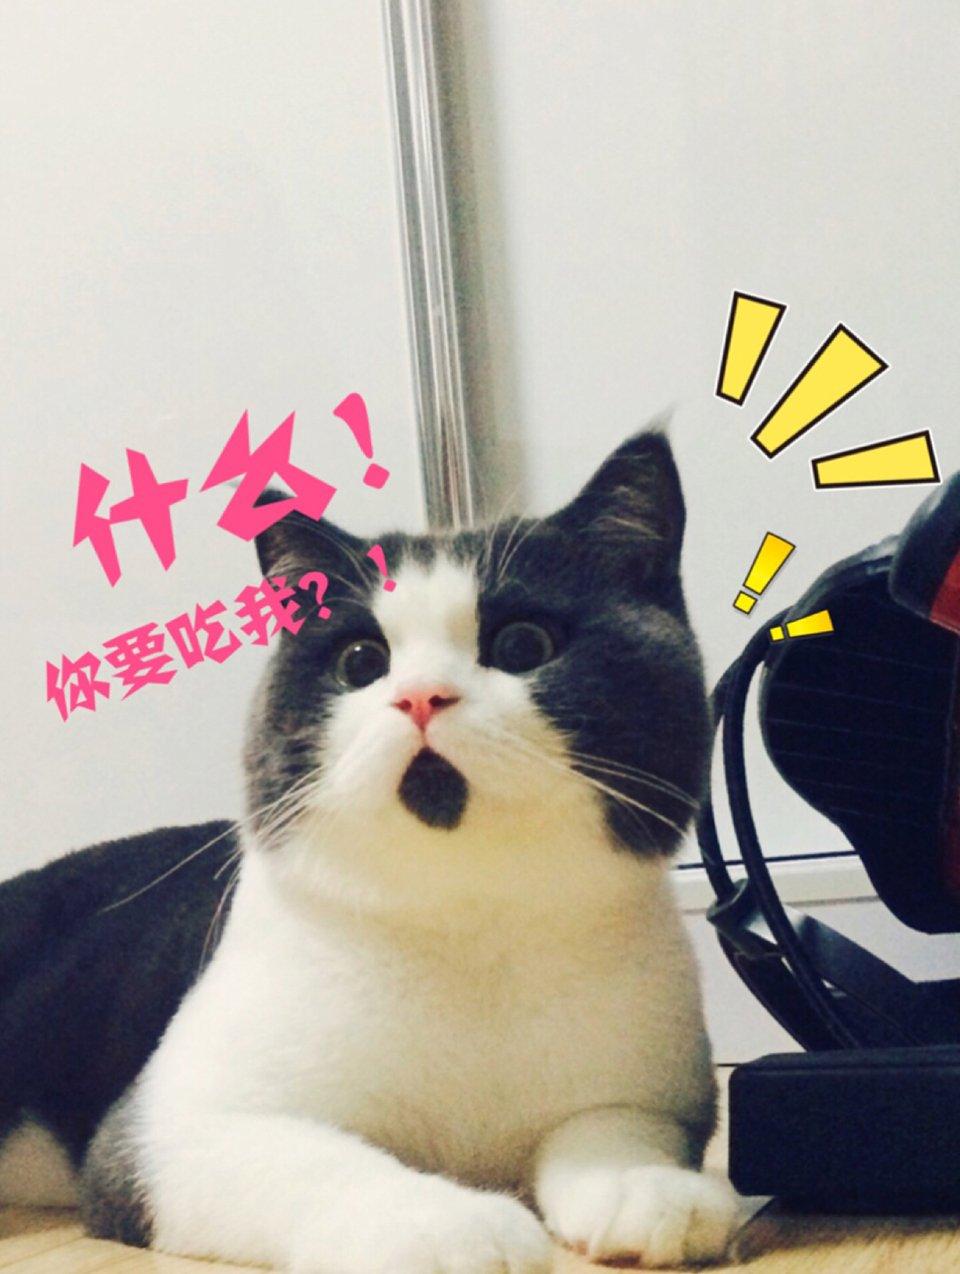 Perpetually Surprised Cat